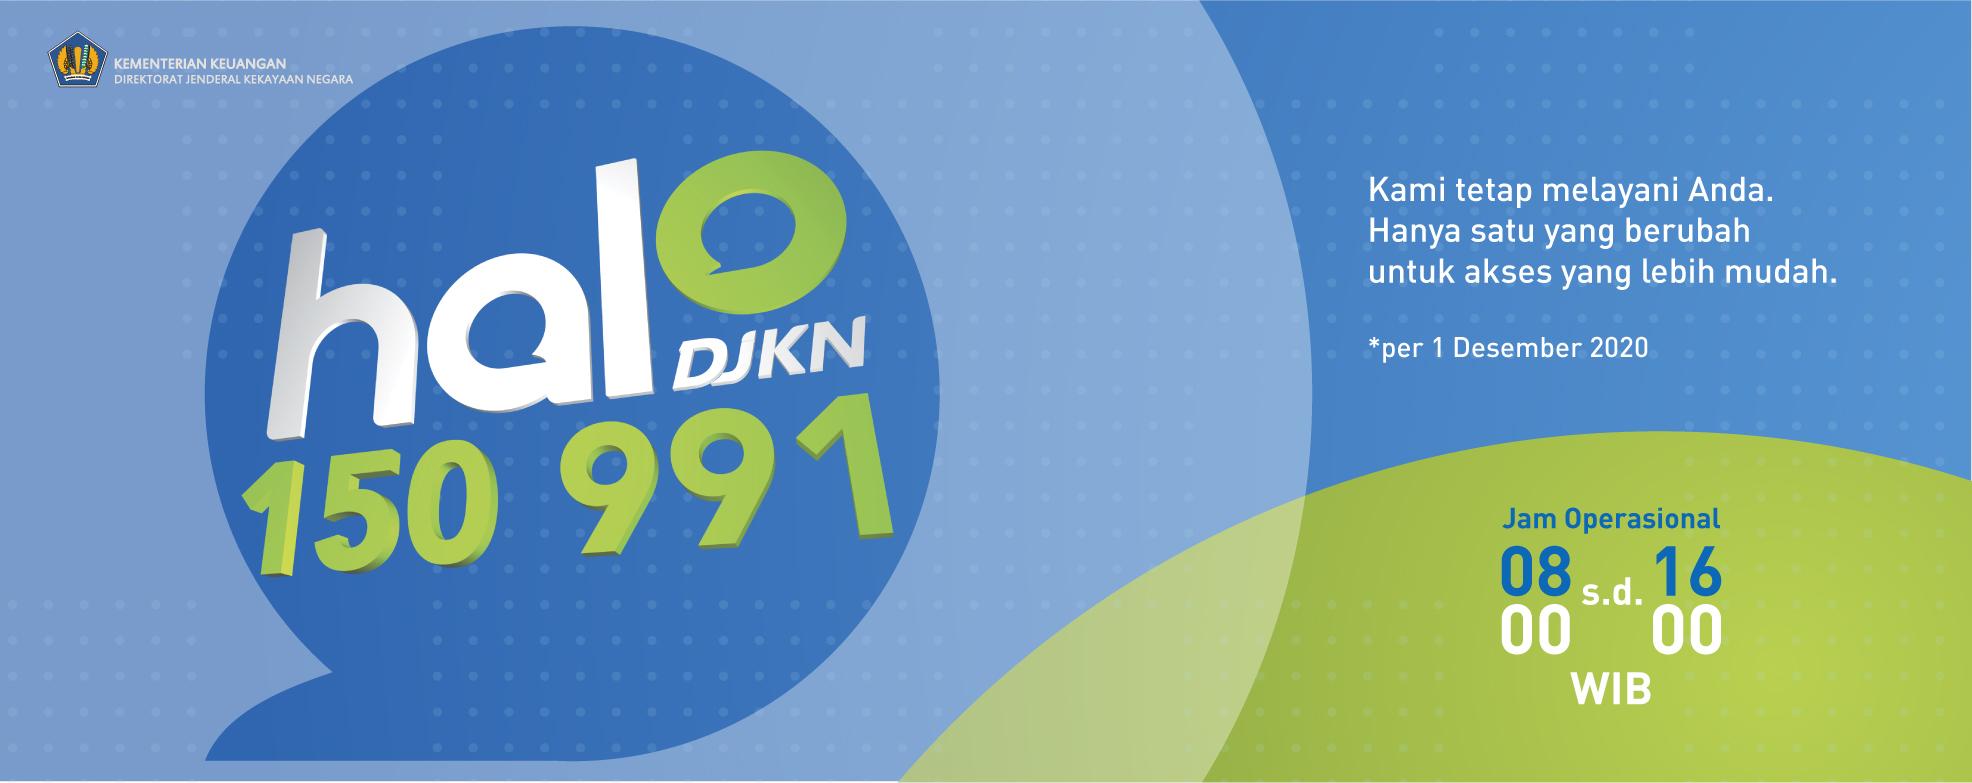 Halo DJKN 150-991